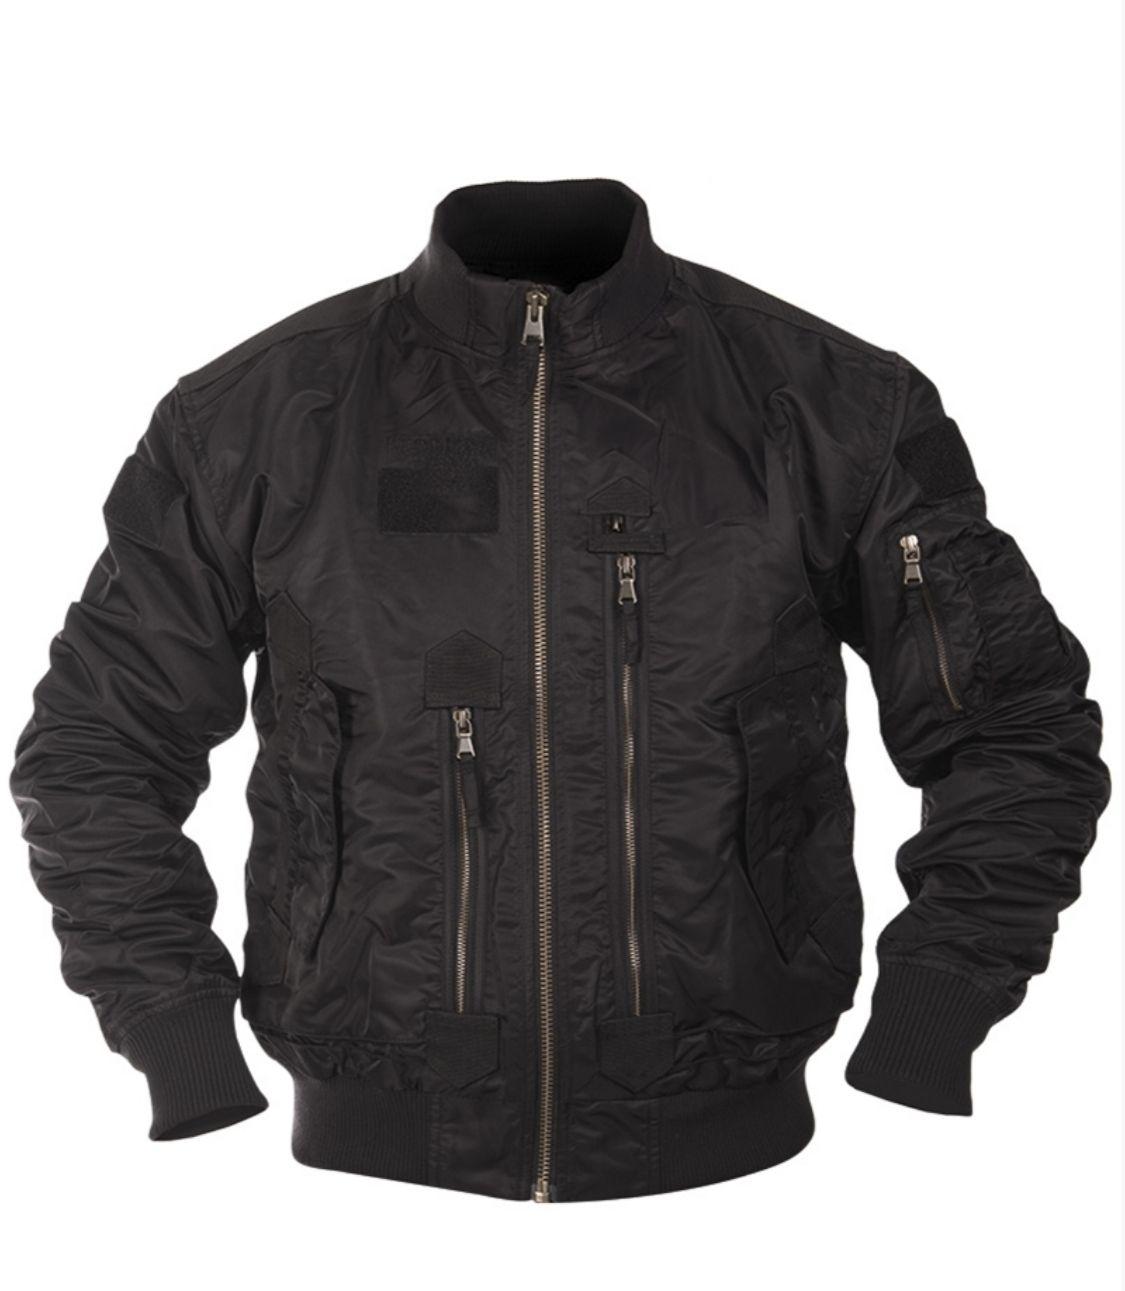 US Tactical flieger jacket černá